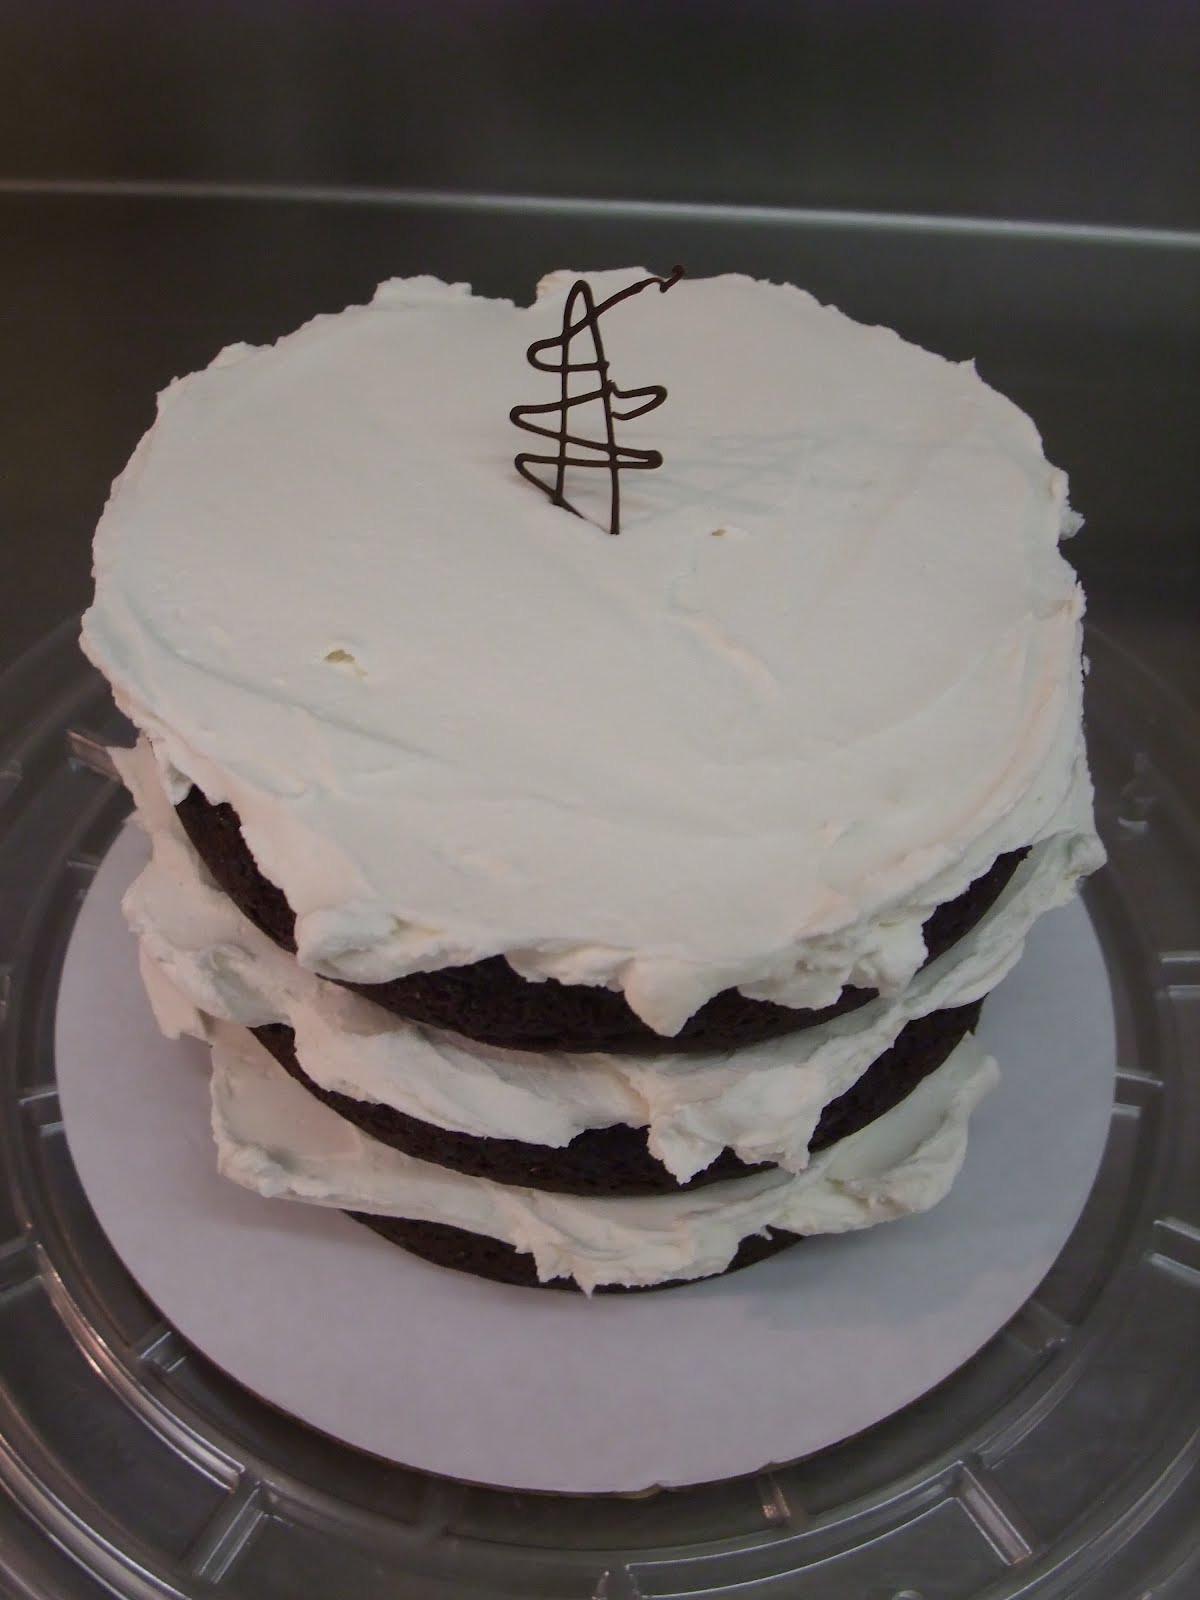 Dairy Free Birthday Cake To Buy  VenerableBean special order Gluten Free Birthday Cake